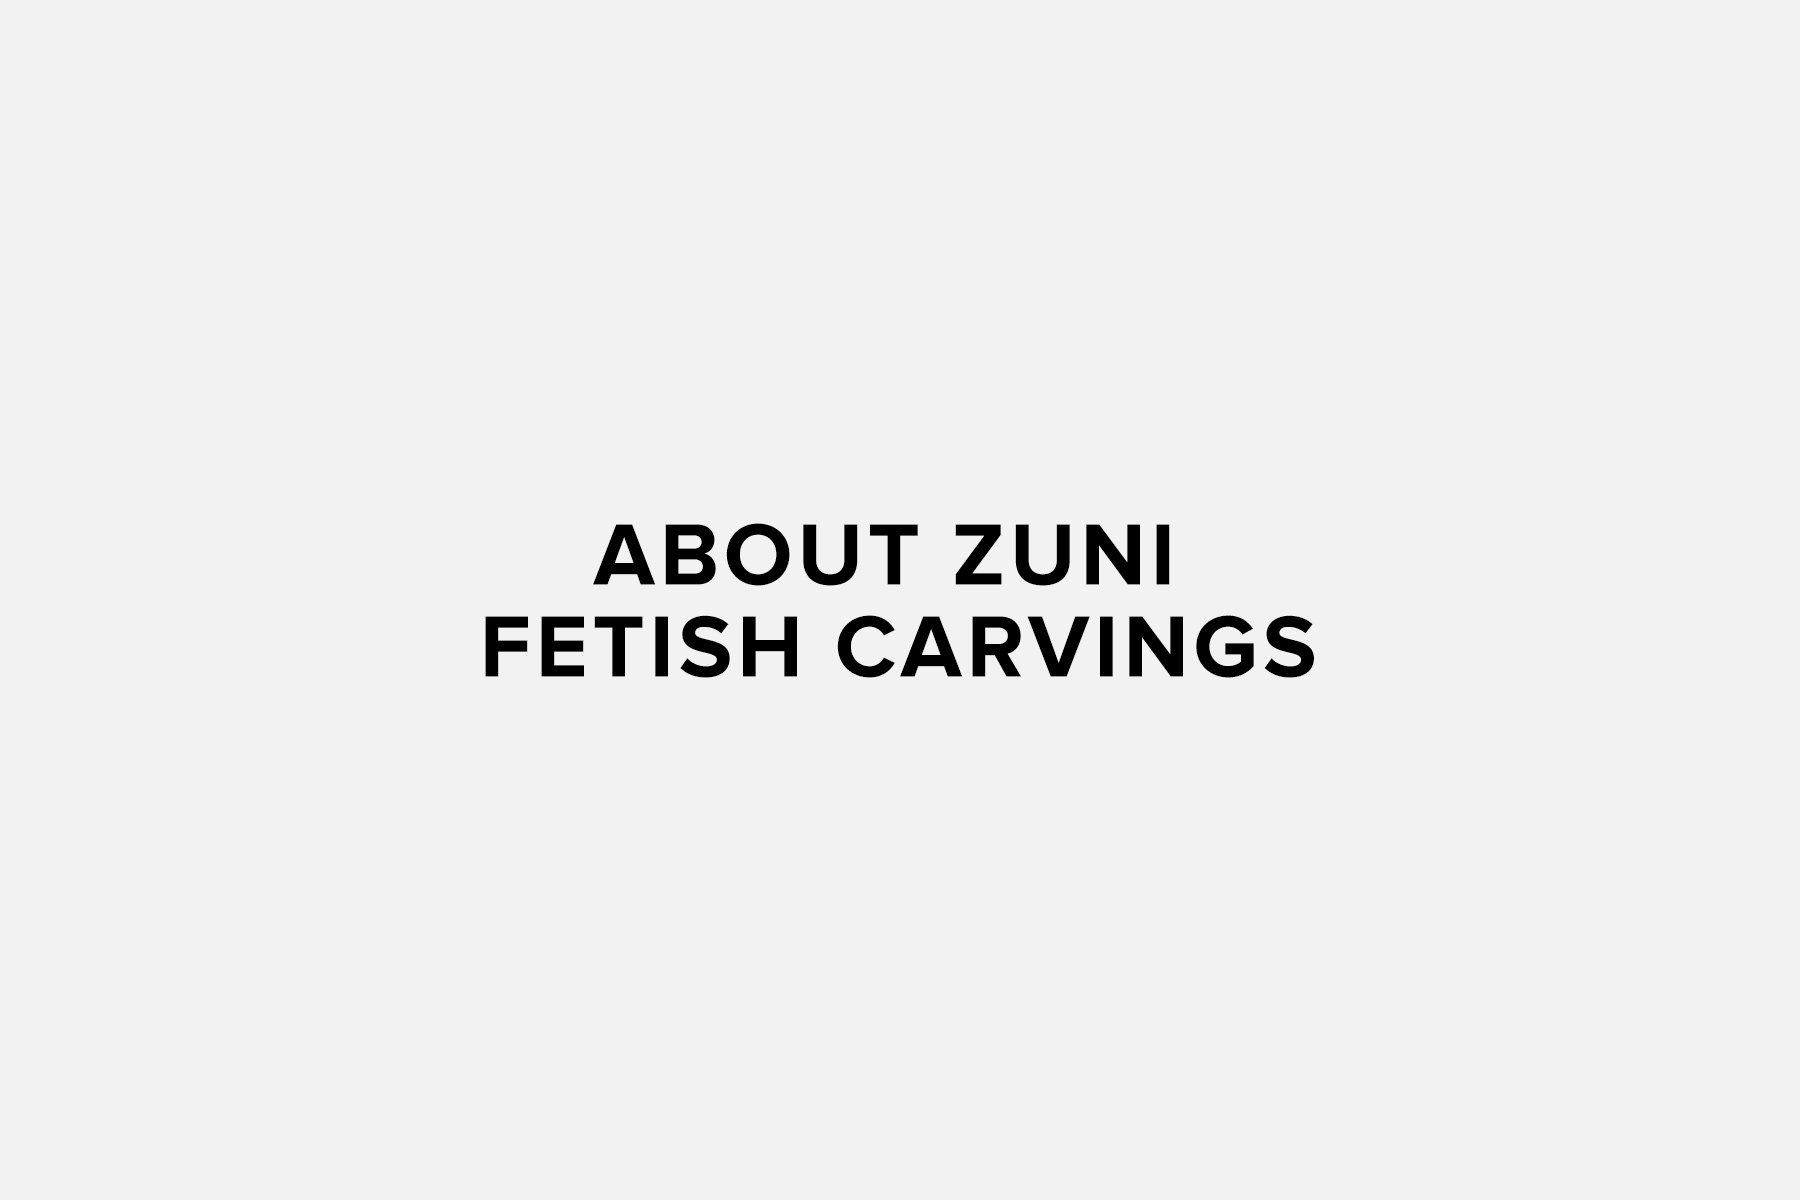 about-zuni-fetish-carvings.jpg